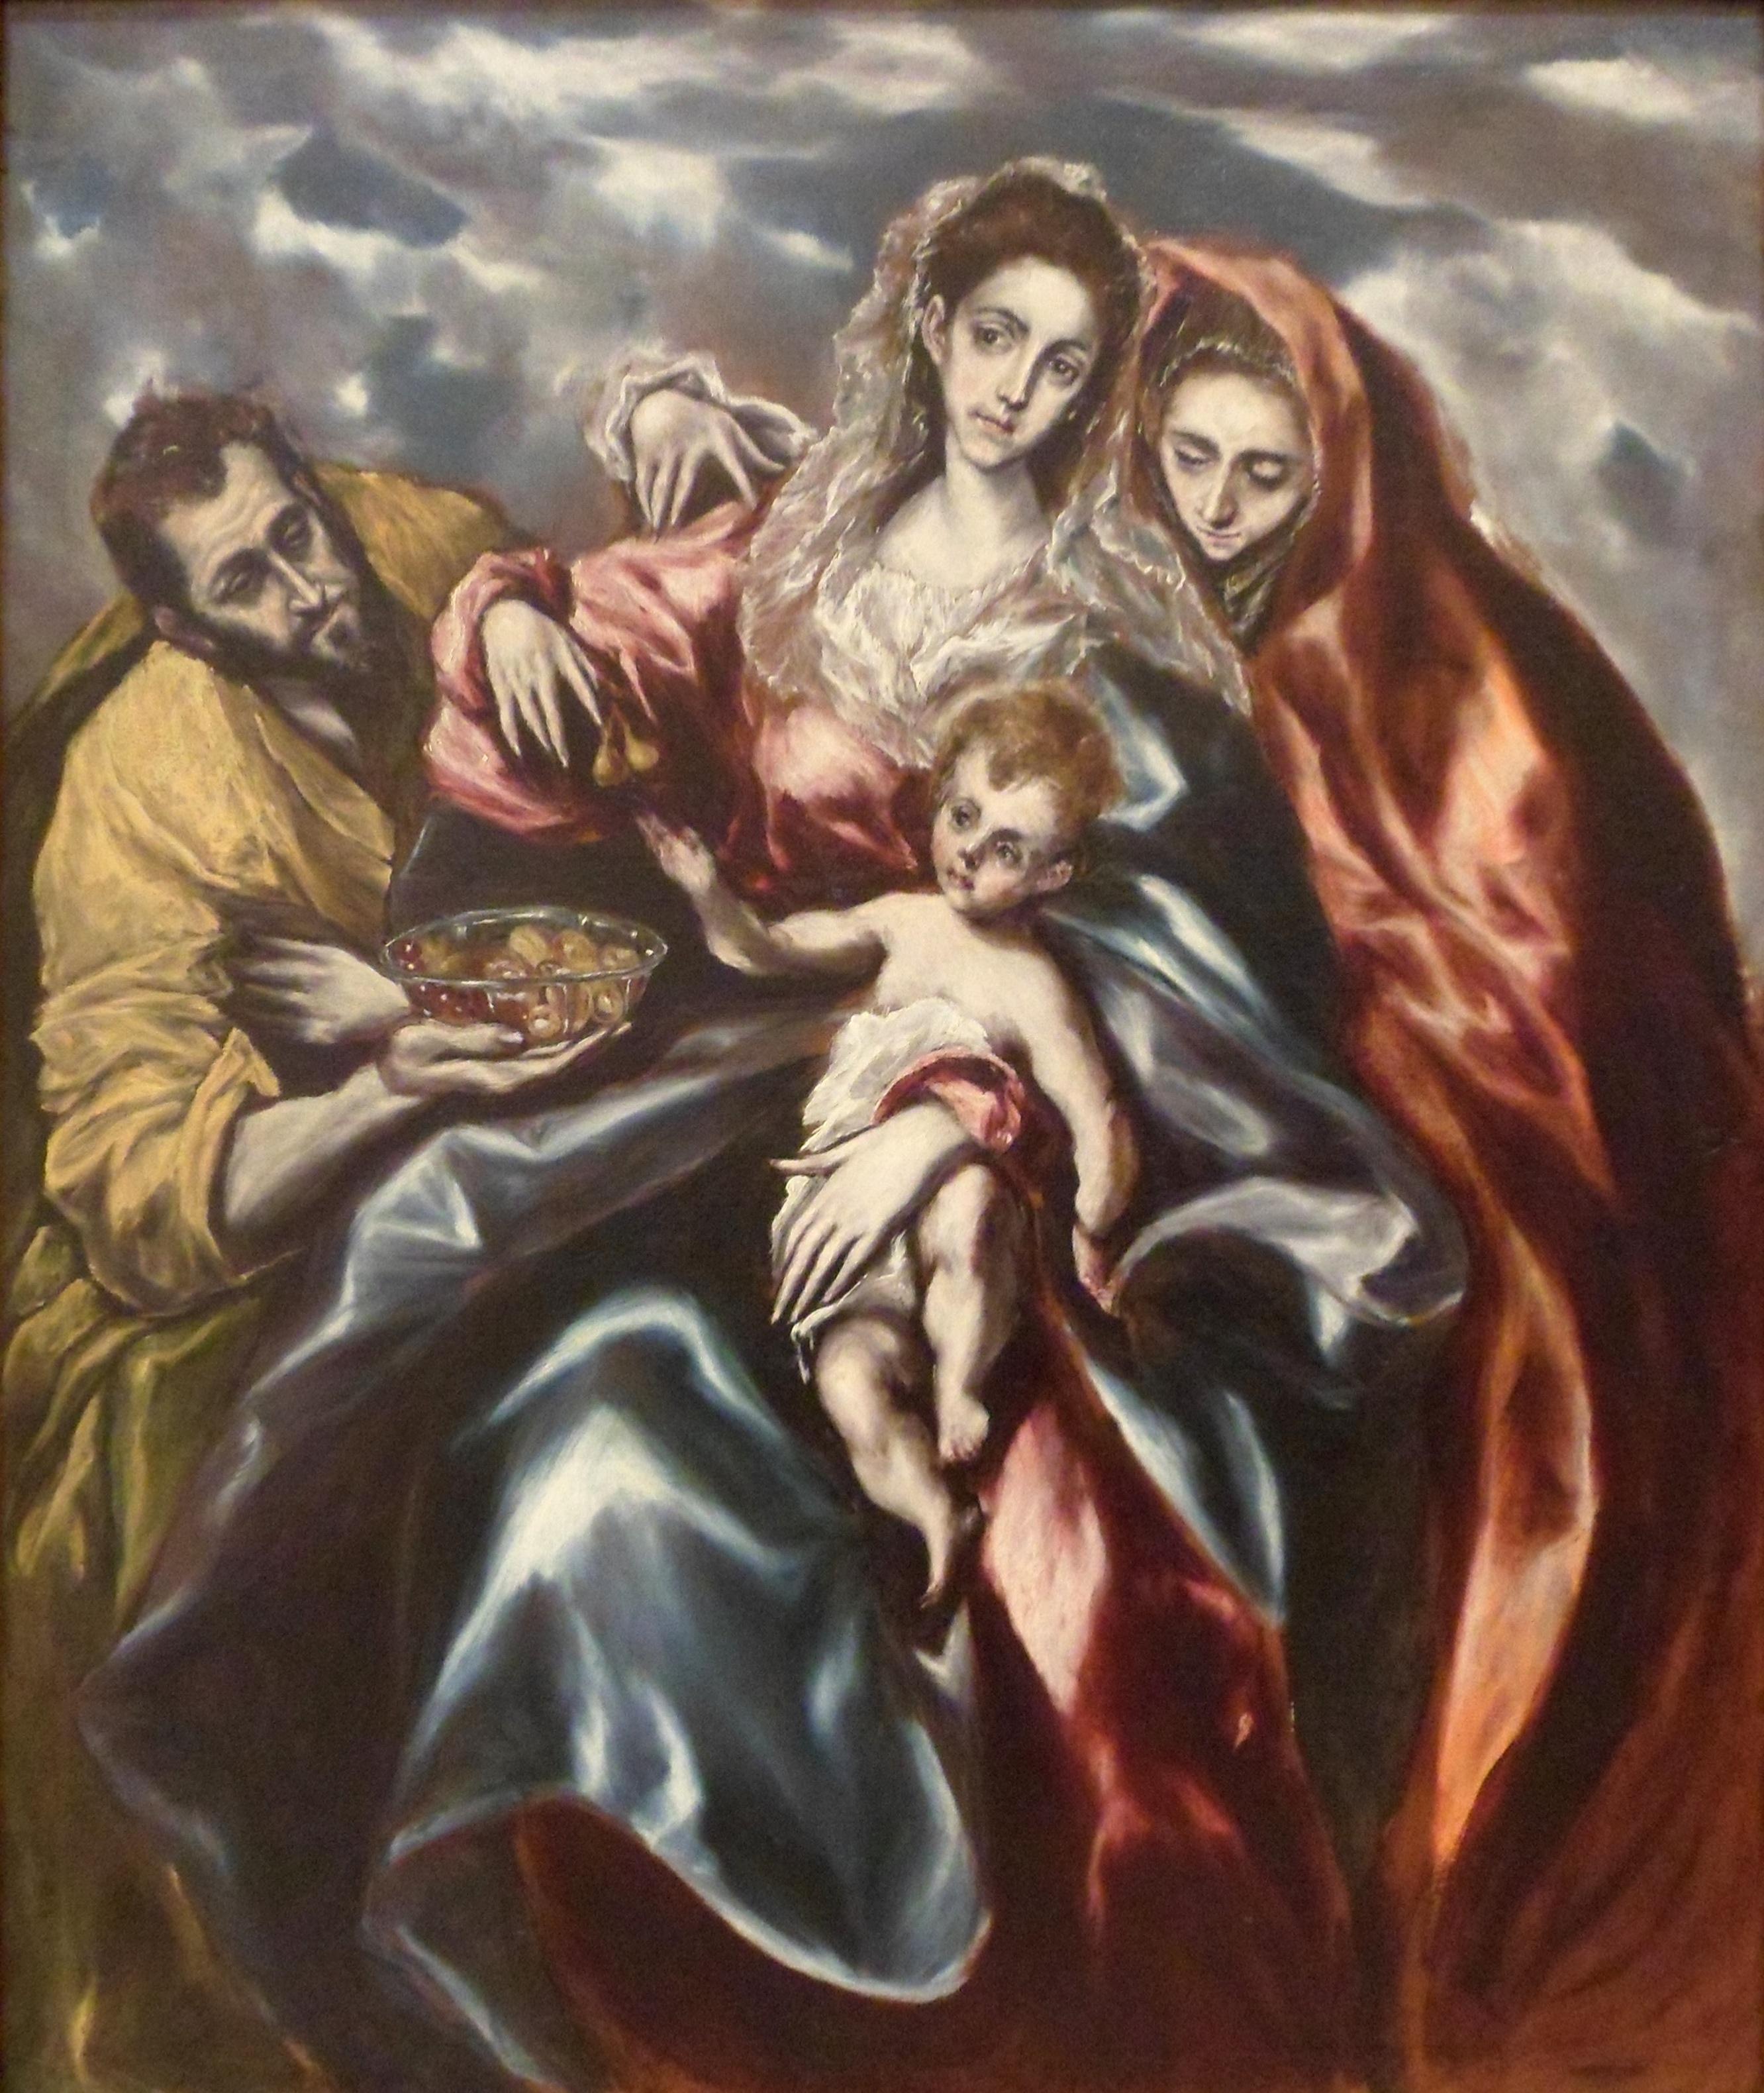 File:El Greco - La Sagrada Familia, c. 1610-11.jpg - Wikimedia Commons